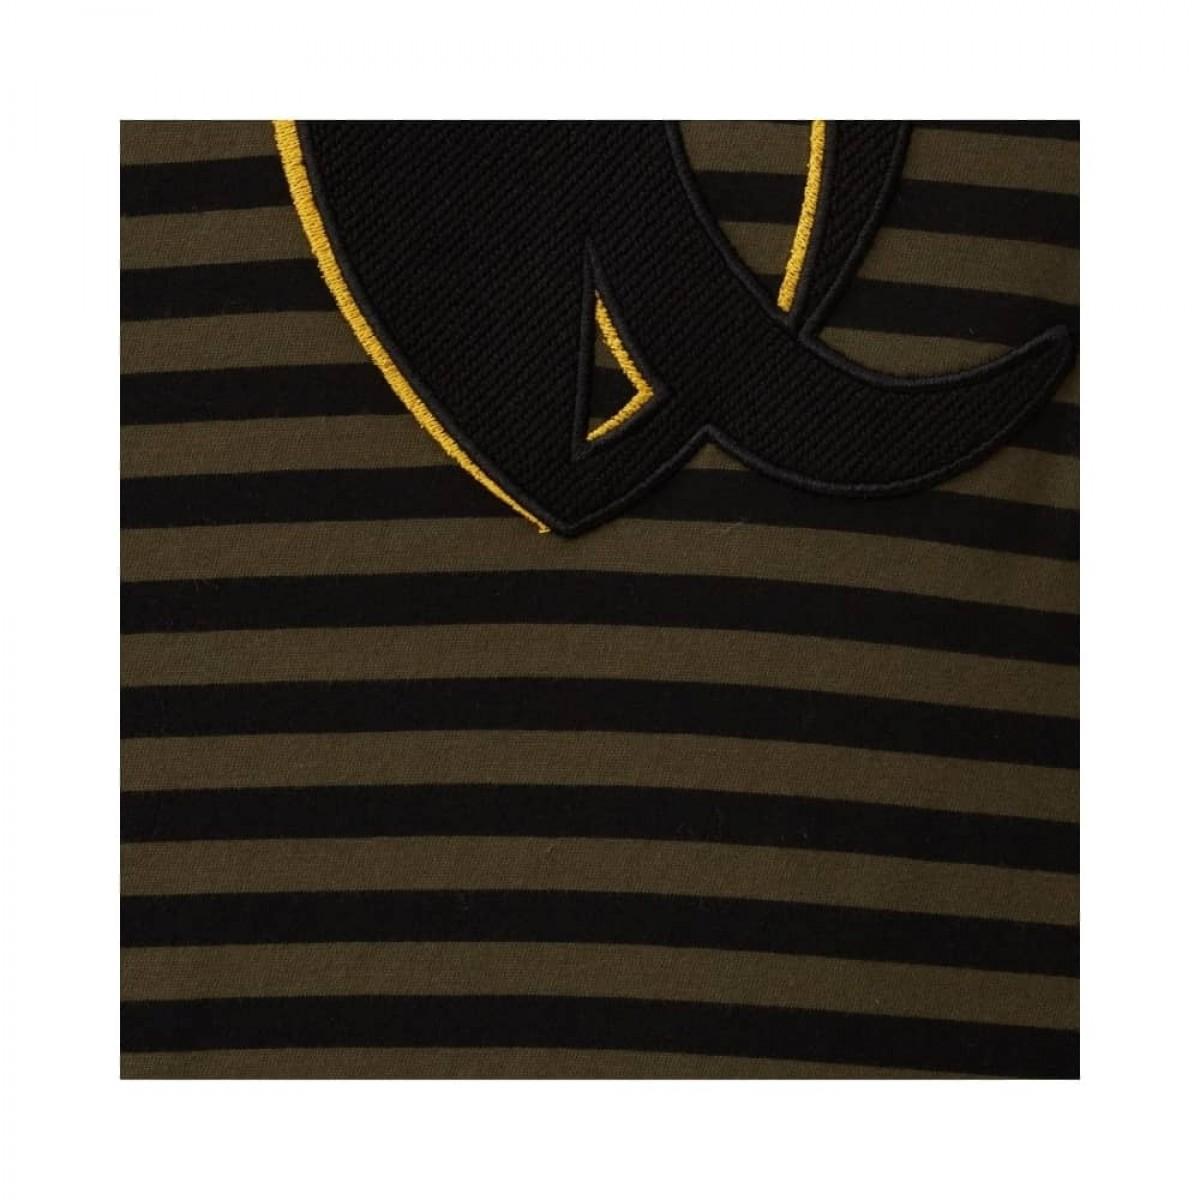 igori longsleeve tee - olive - logo